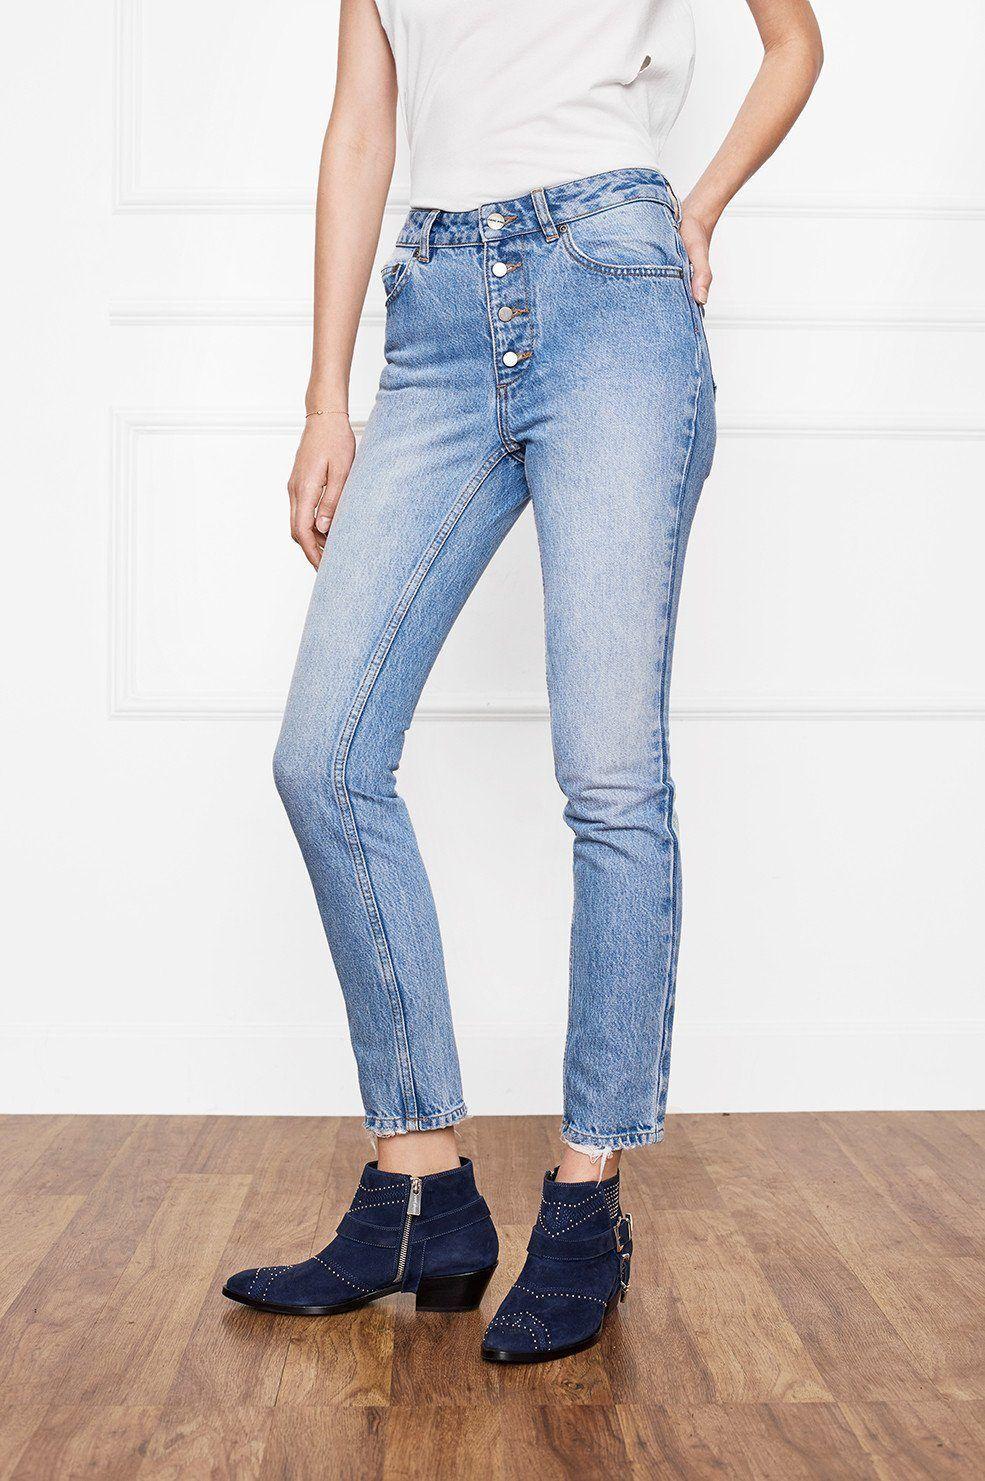 Anine Bing Frida Jean Straight Leg Classic Denim Straight Leg Jeans Denim